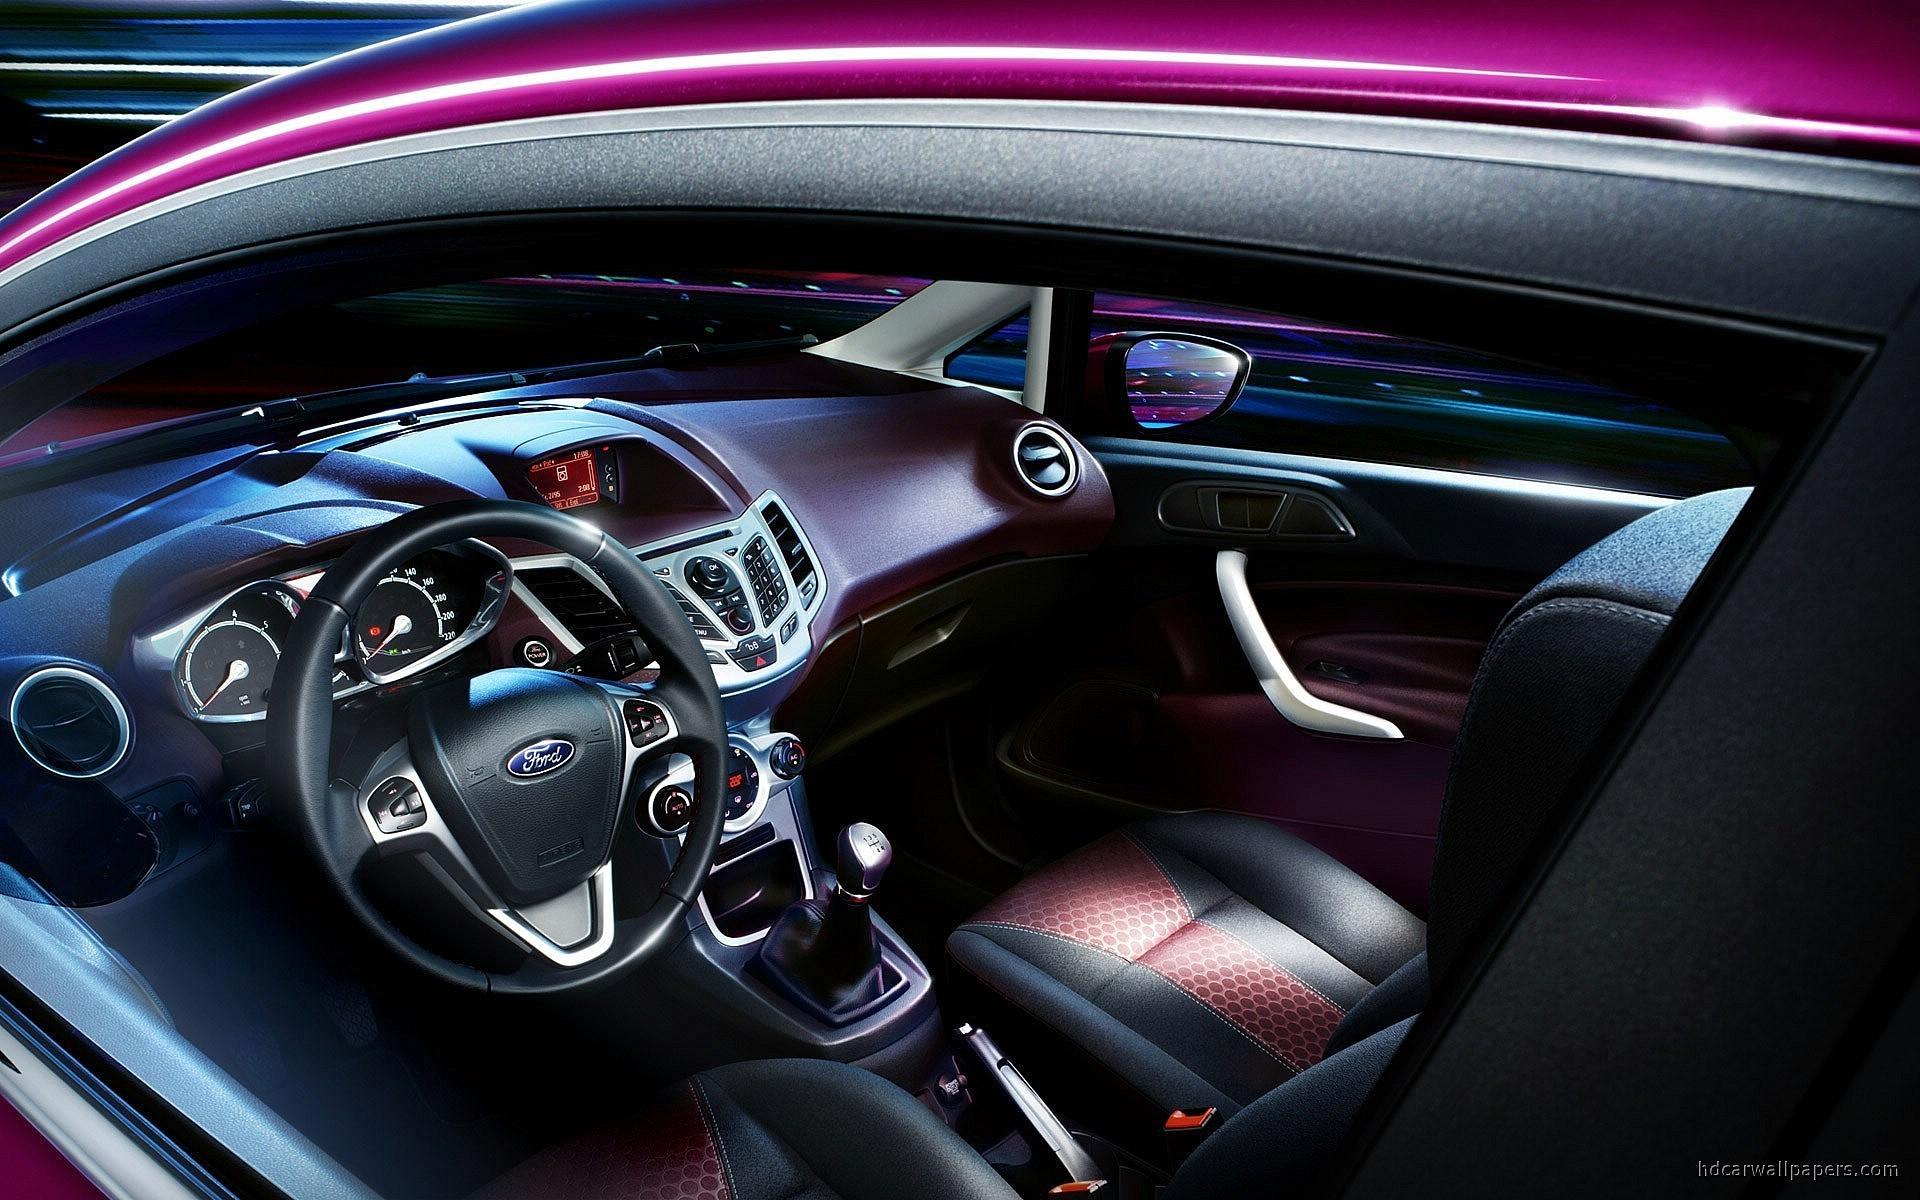 Res: 1920x1200, Ford Fiesta Interieur Tapete In  Auflösung Iphone